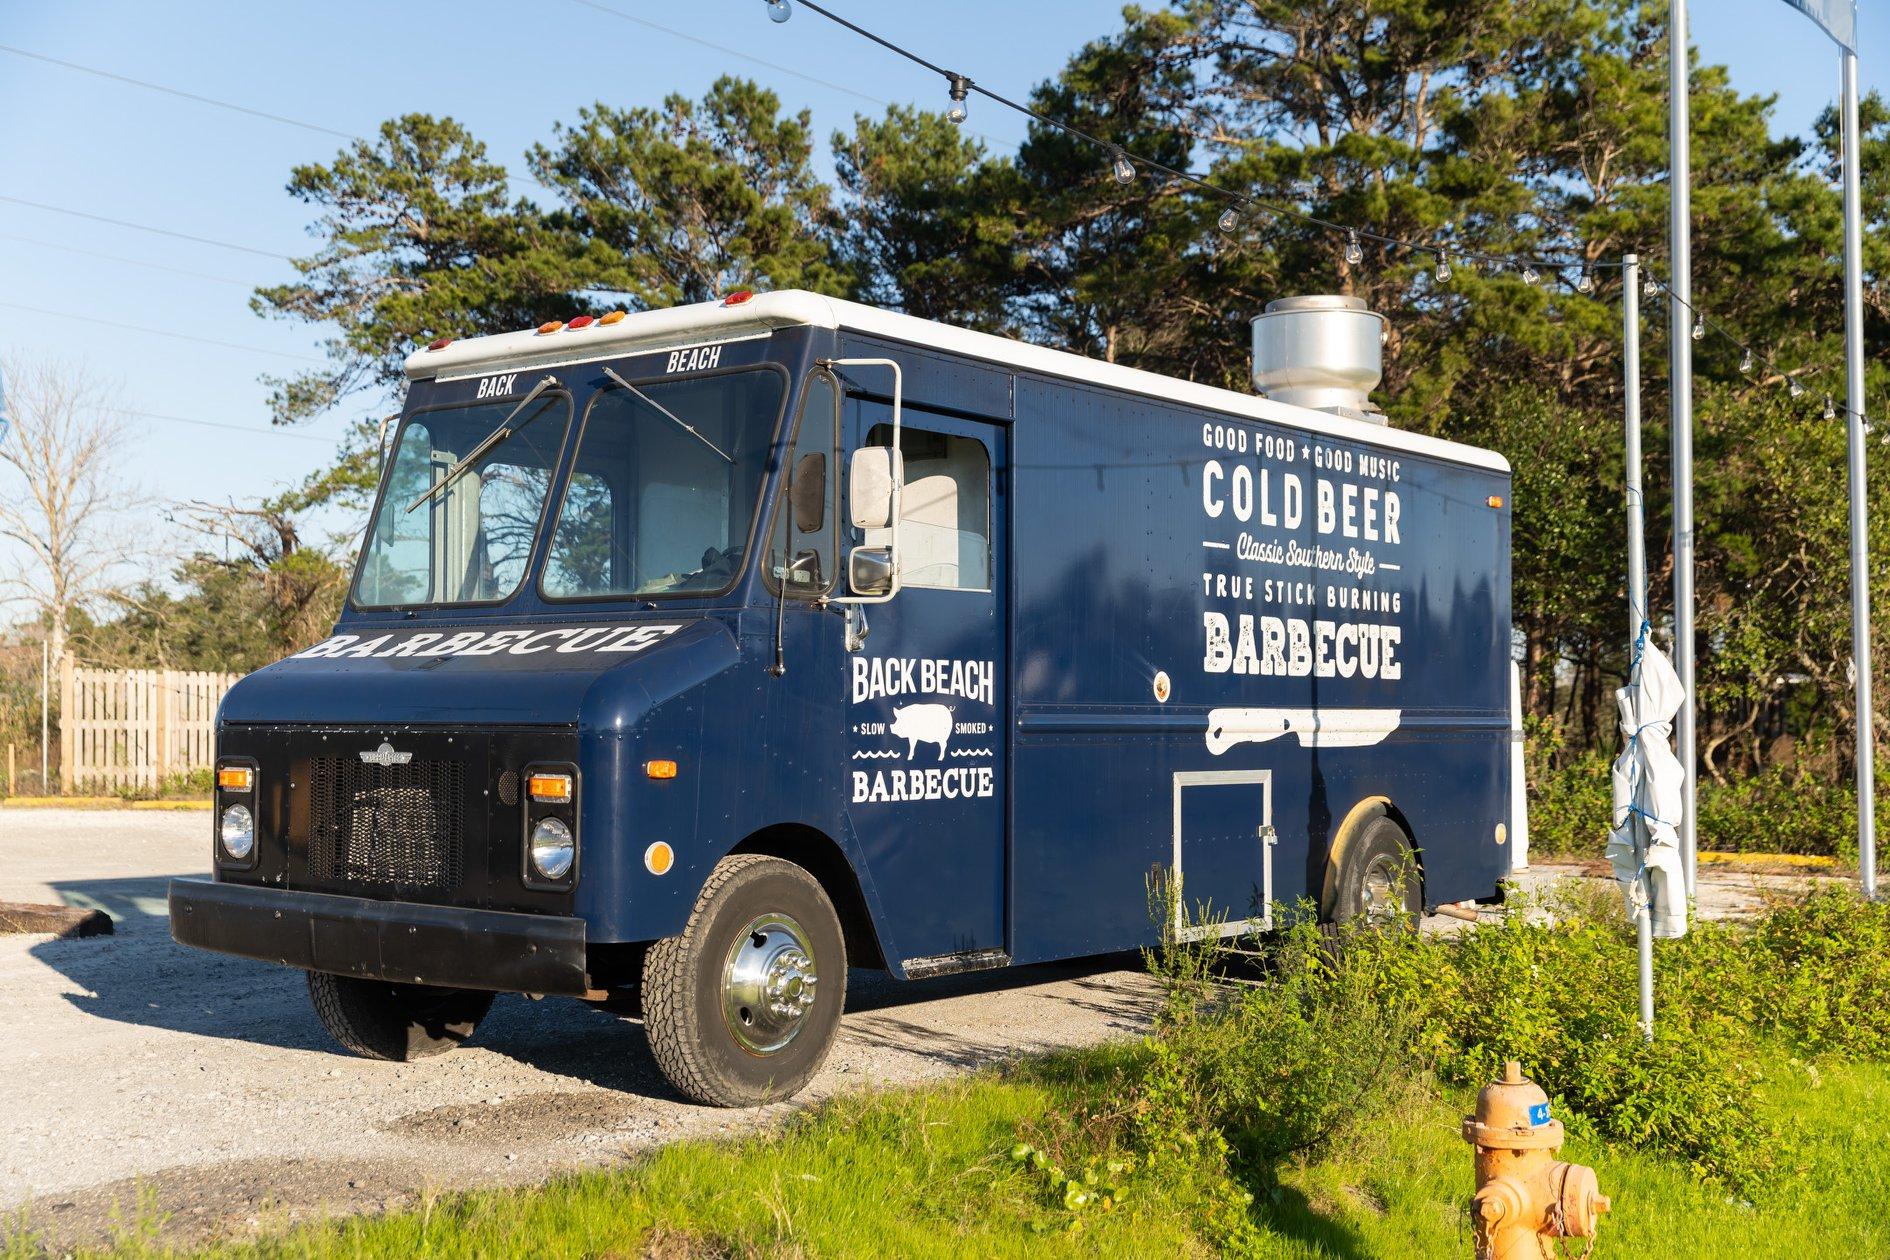 Back Beach Barbecue Food Truck